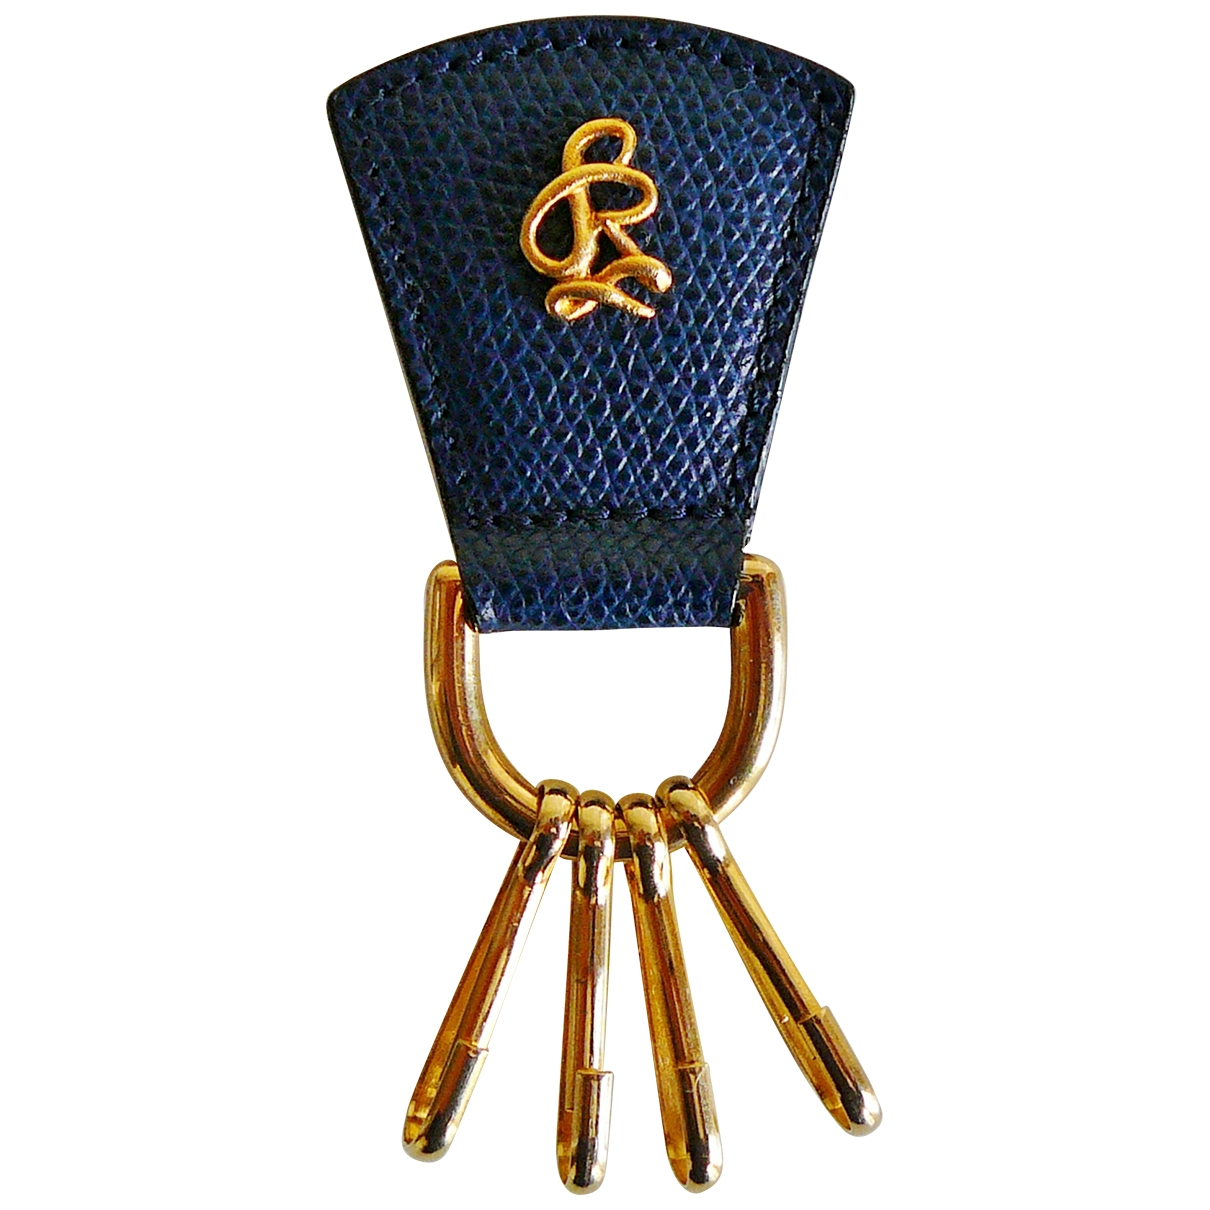 Sonia Rykiel - Petite maroquinerie   pour femme en cuir - bleu